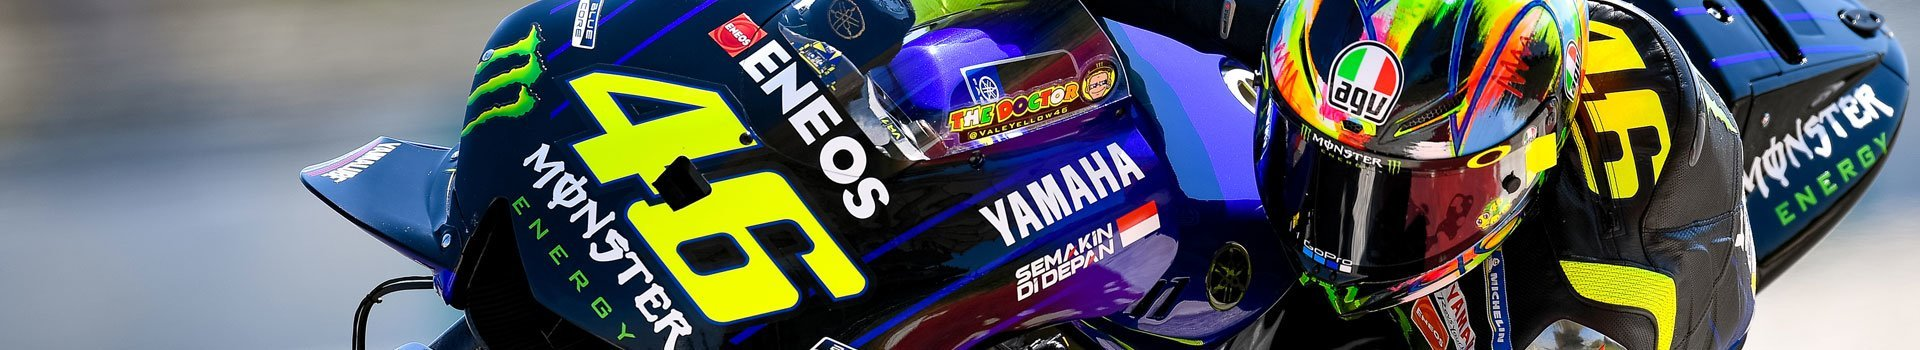 Gorras Oficiales Valentino Rossi